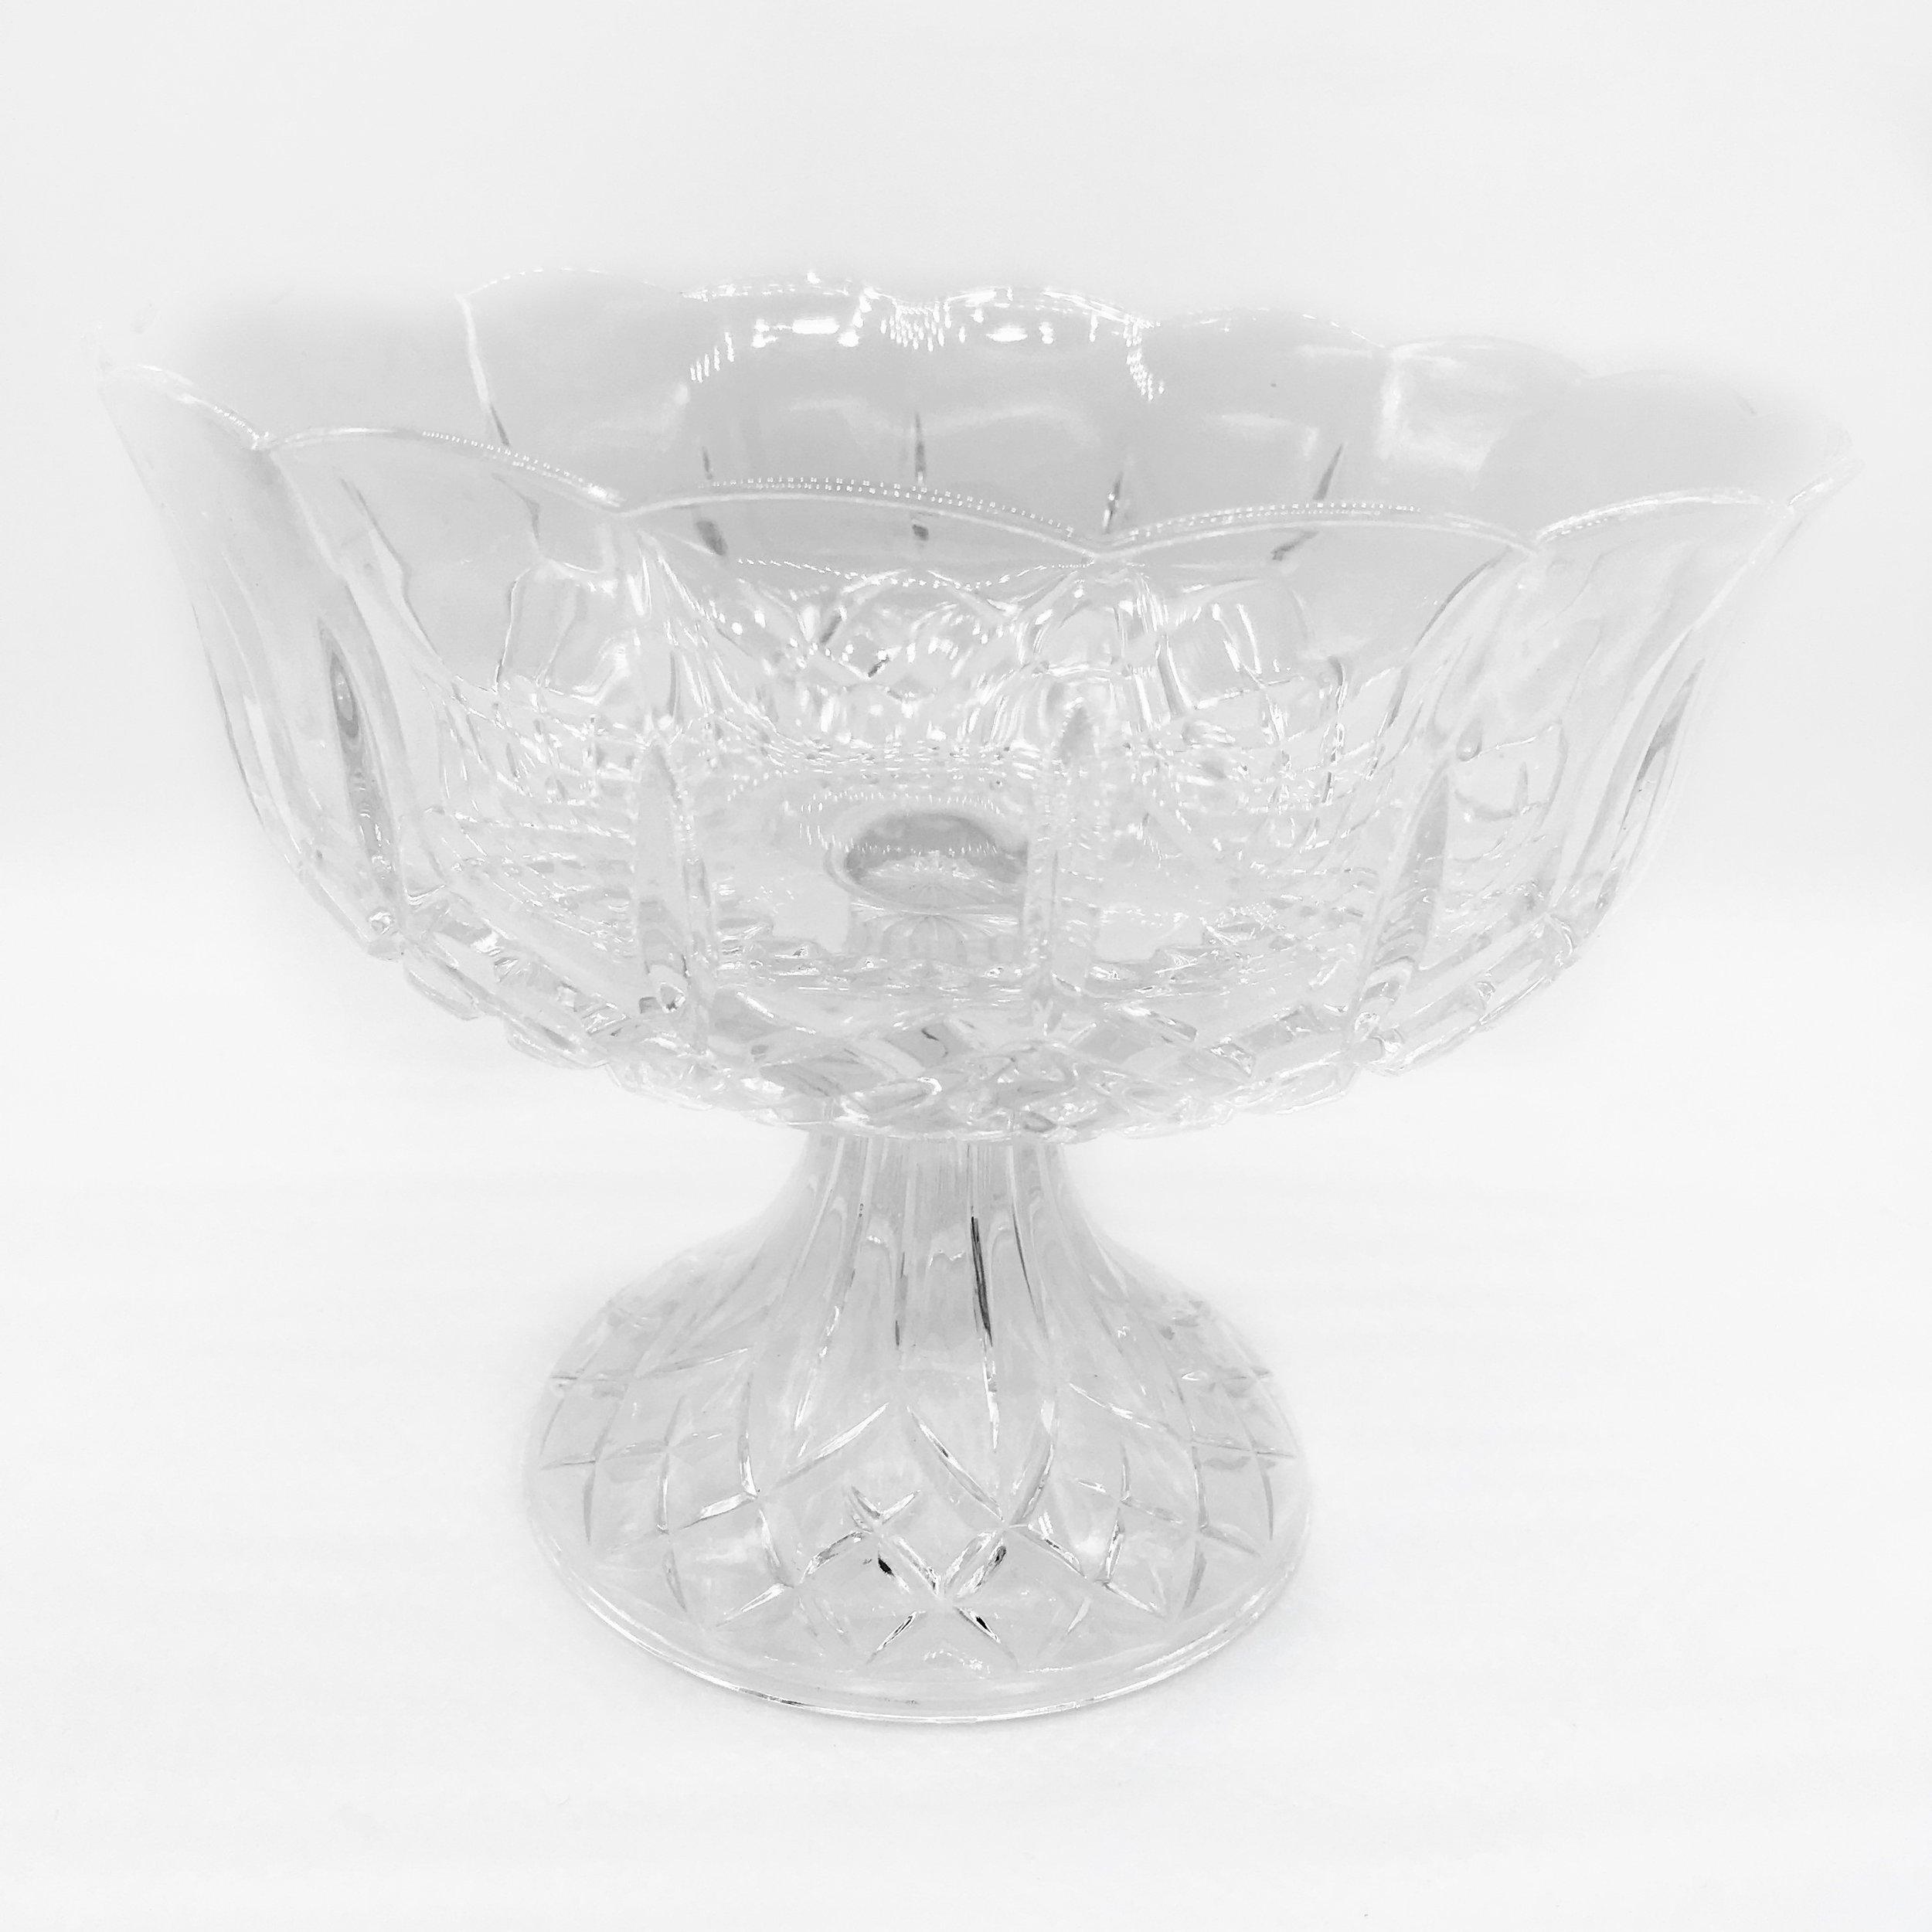 Serving bowl - vintage crystal (medium)  Price: $12.00  Qty: 1